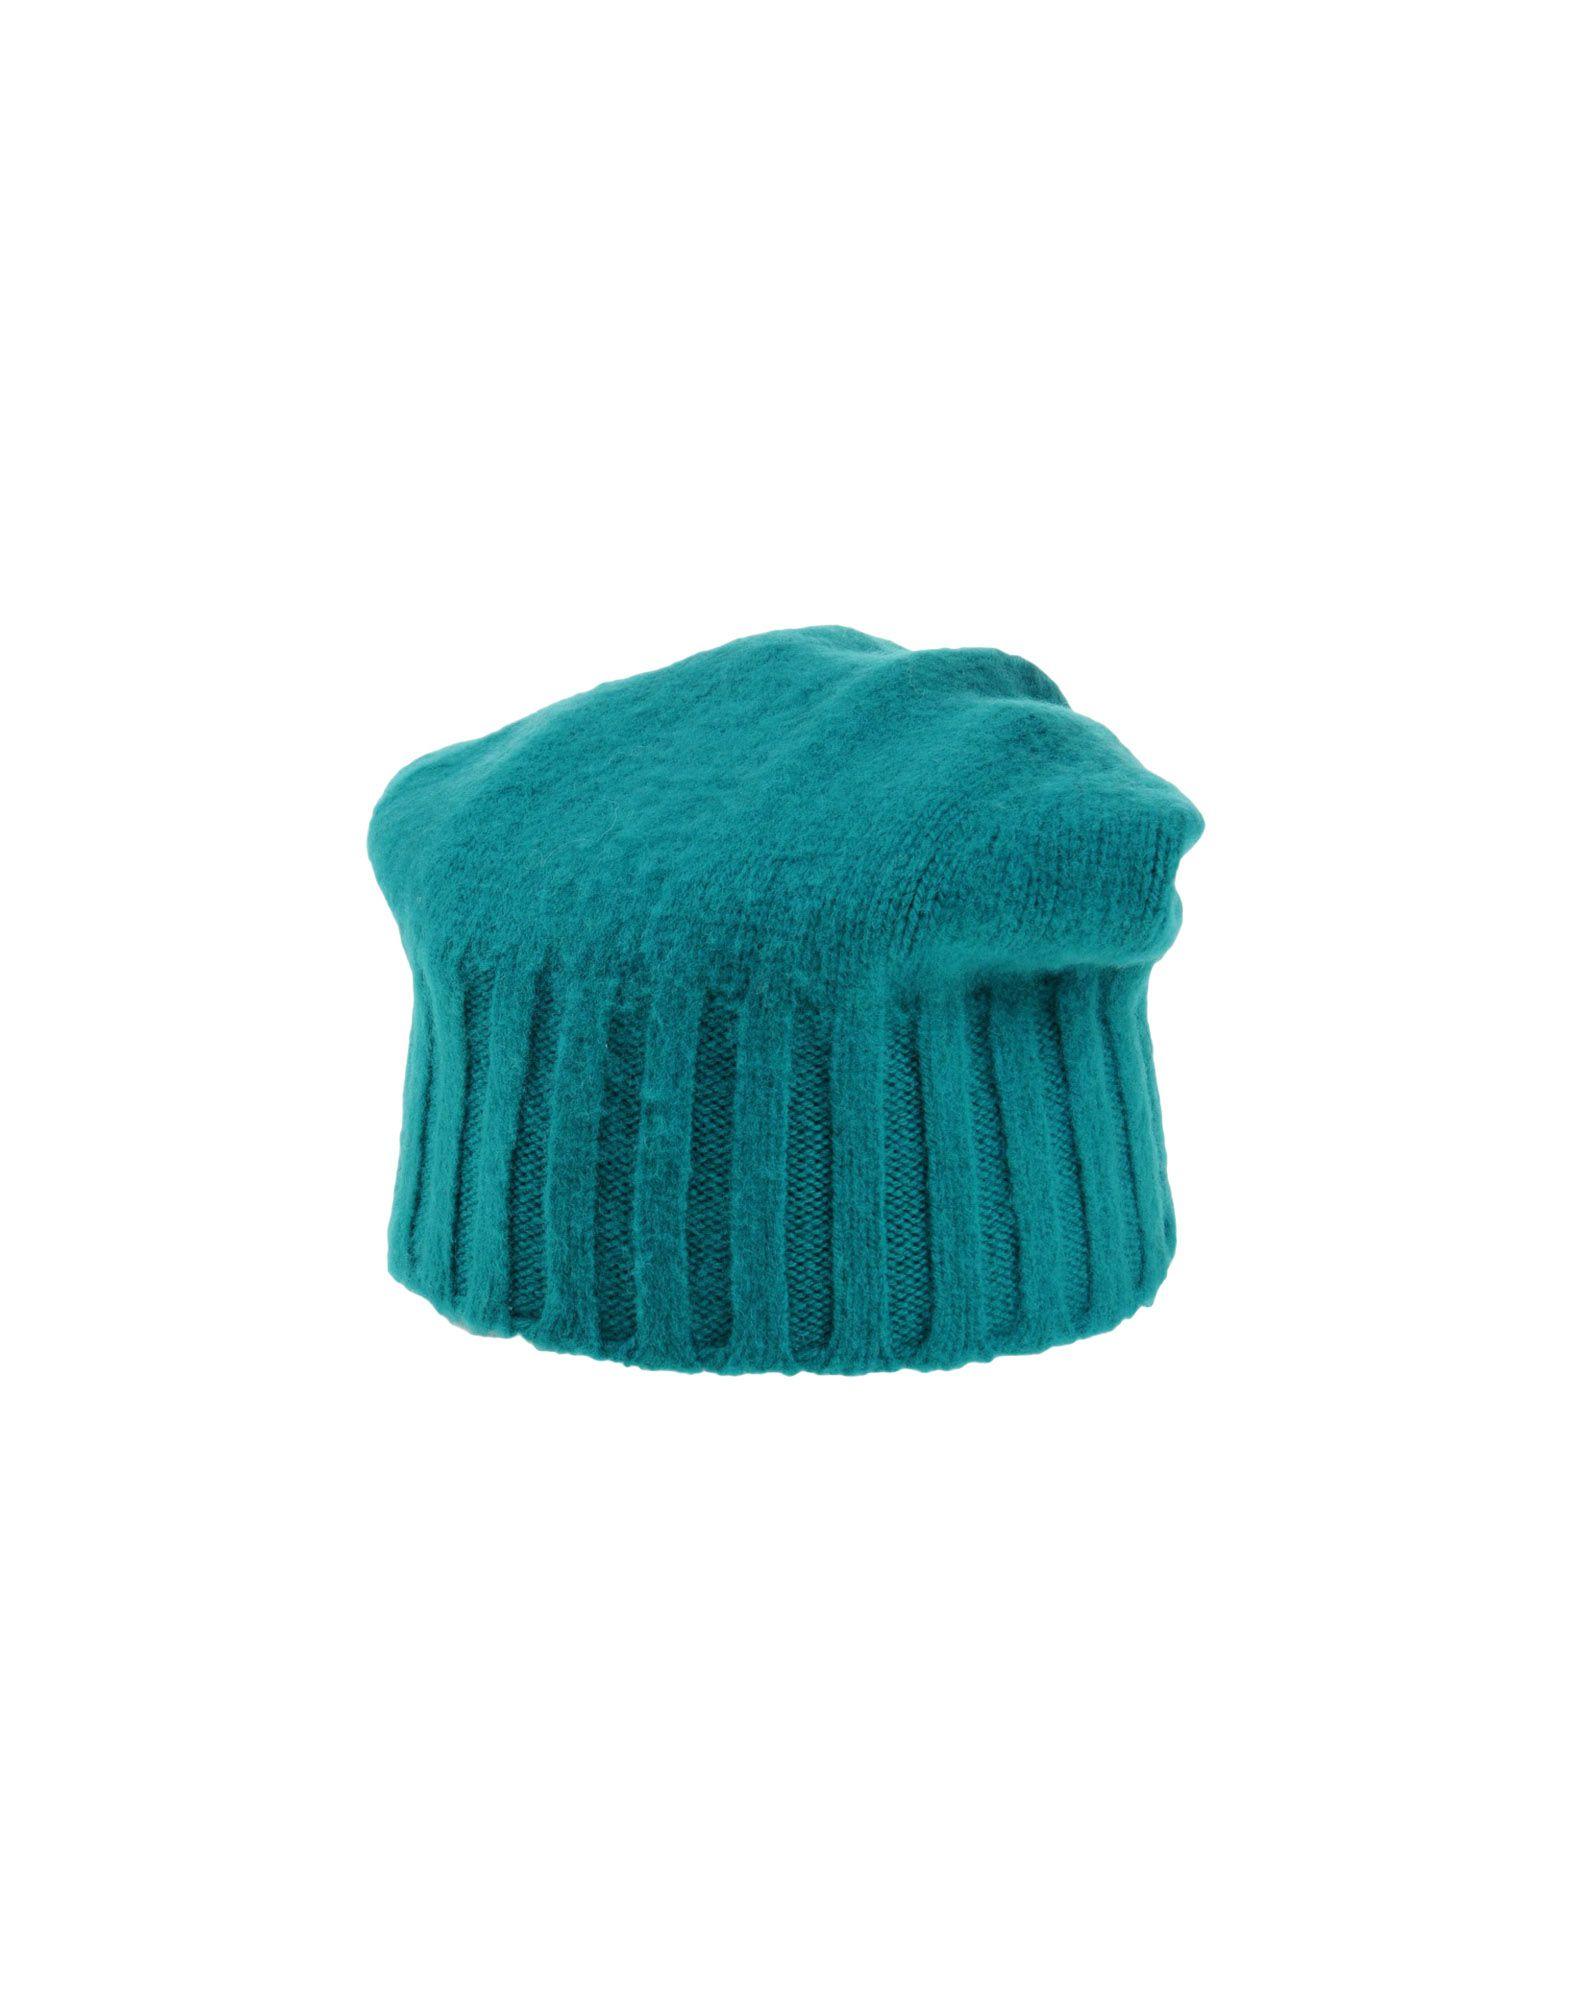 ACCESSORIES - Hats Jucca Tg1uR